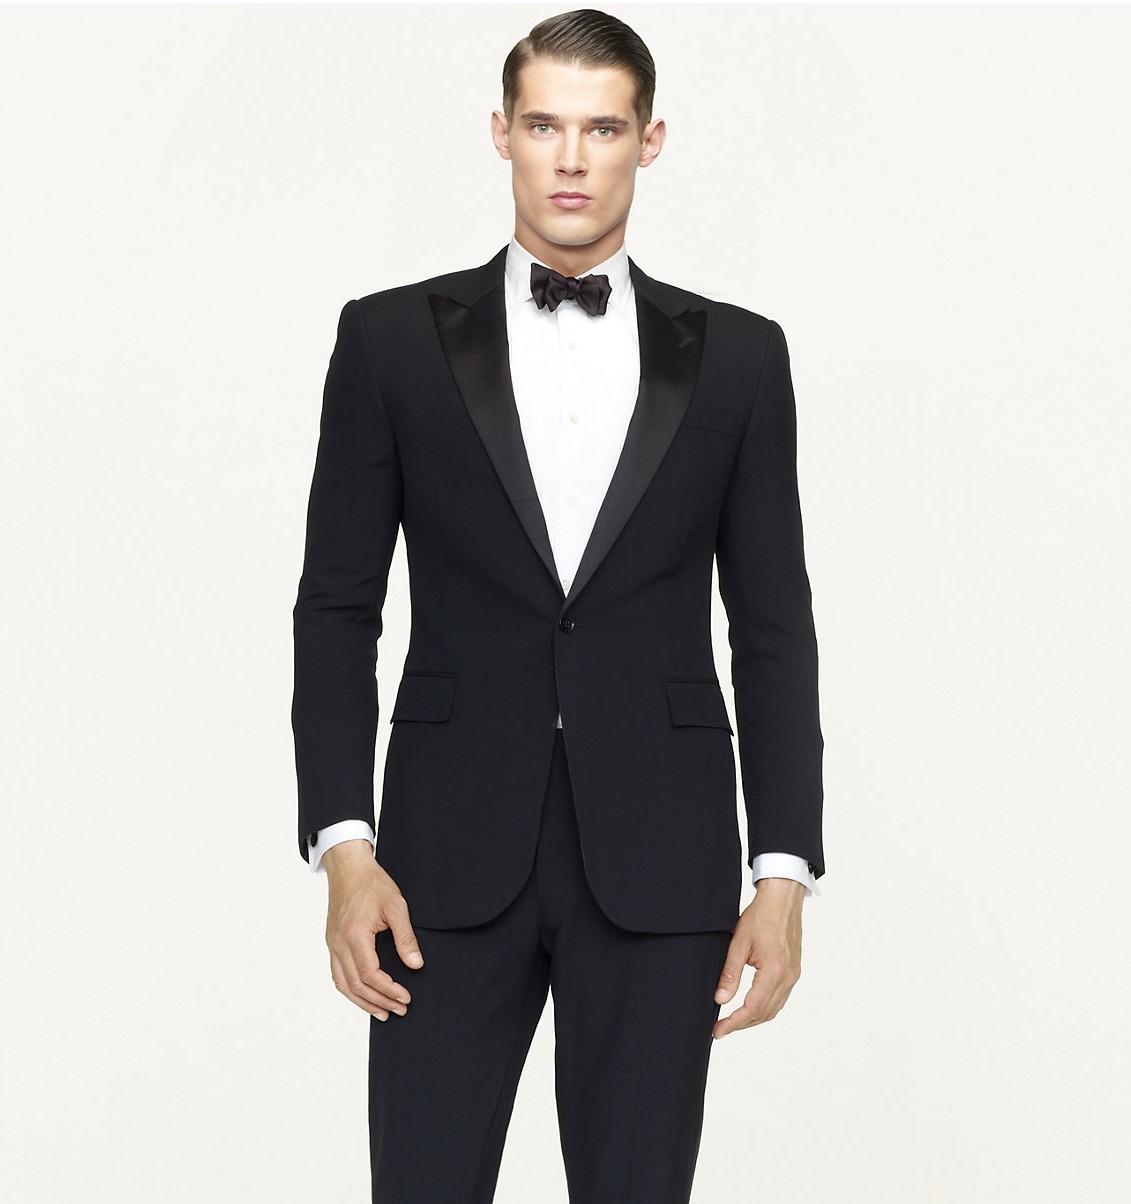 Aliexpress.com Comprar Trajes para hombre con pantalones smoking baratos Mens Blazers alcanzó solapa hombres trajes trajes traje negro de la boda para